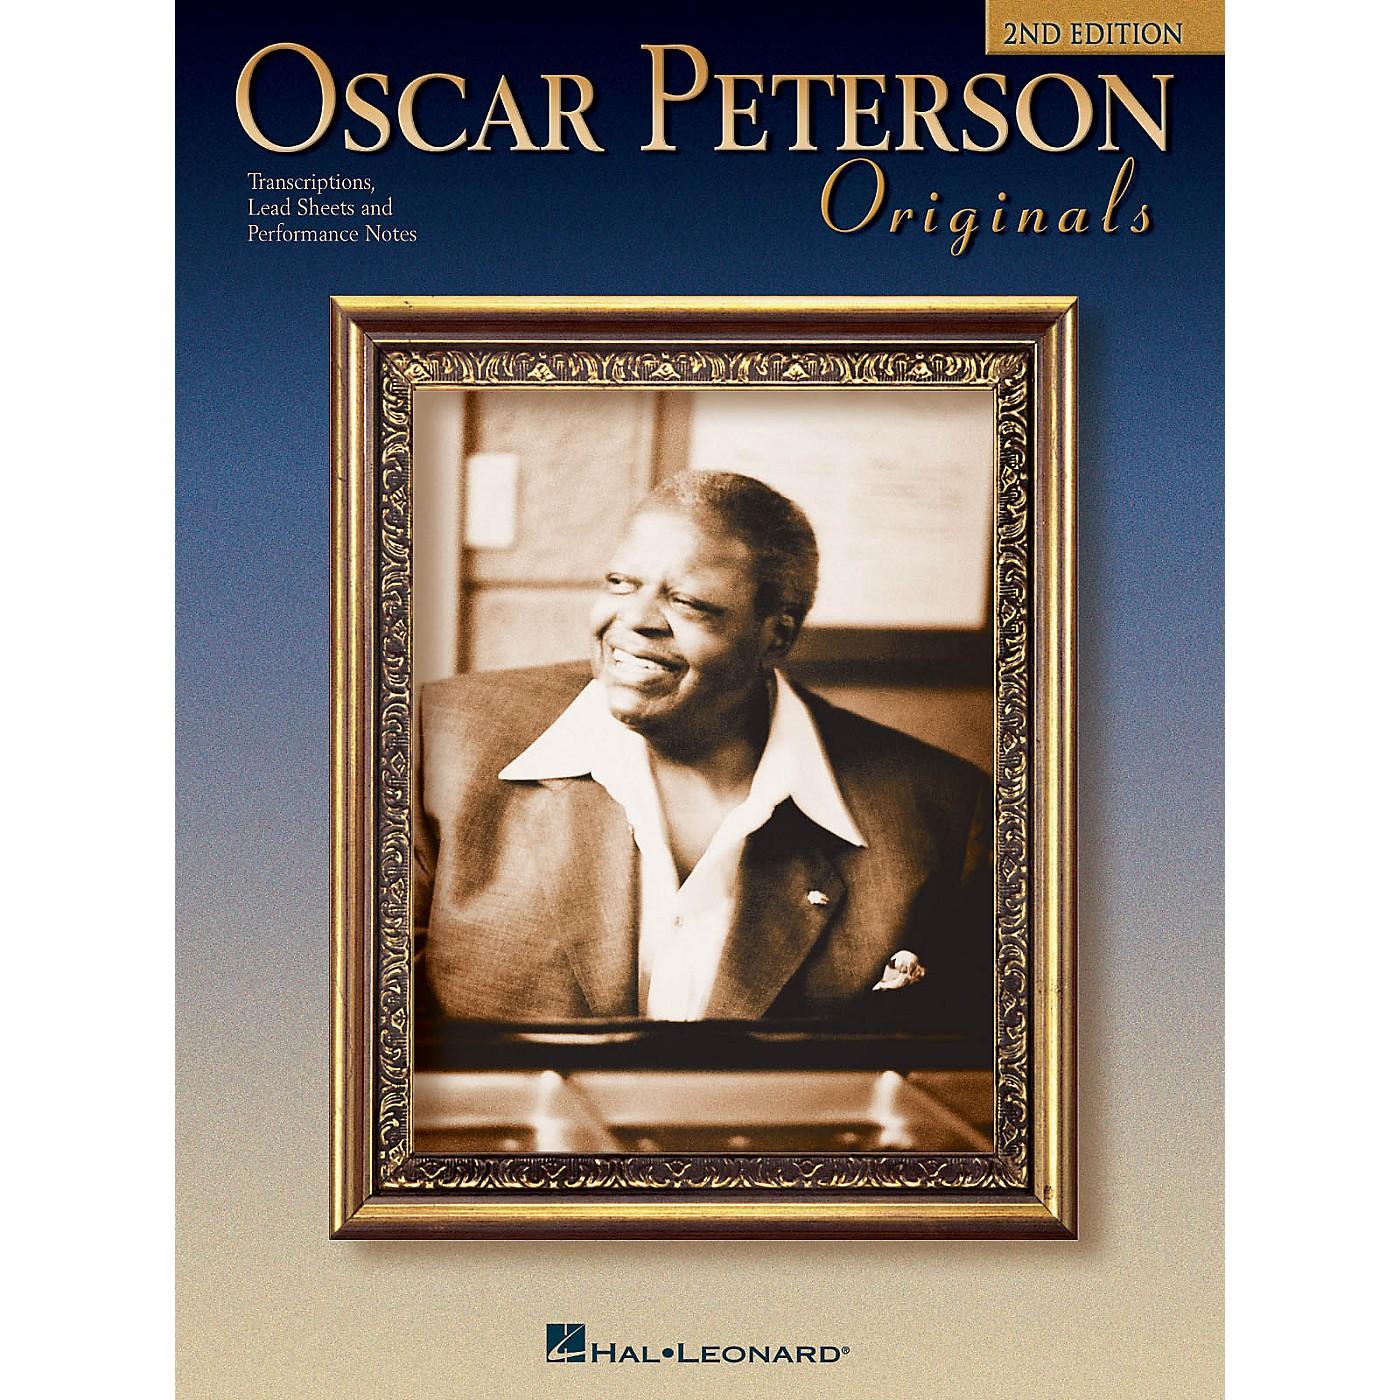 Hal Leonard Oscar Peterson Originals, 2nd Edition Artist Transcriptions Series Performed by Oscar Peterson thumbnail